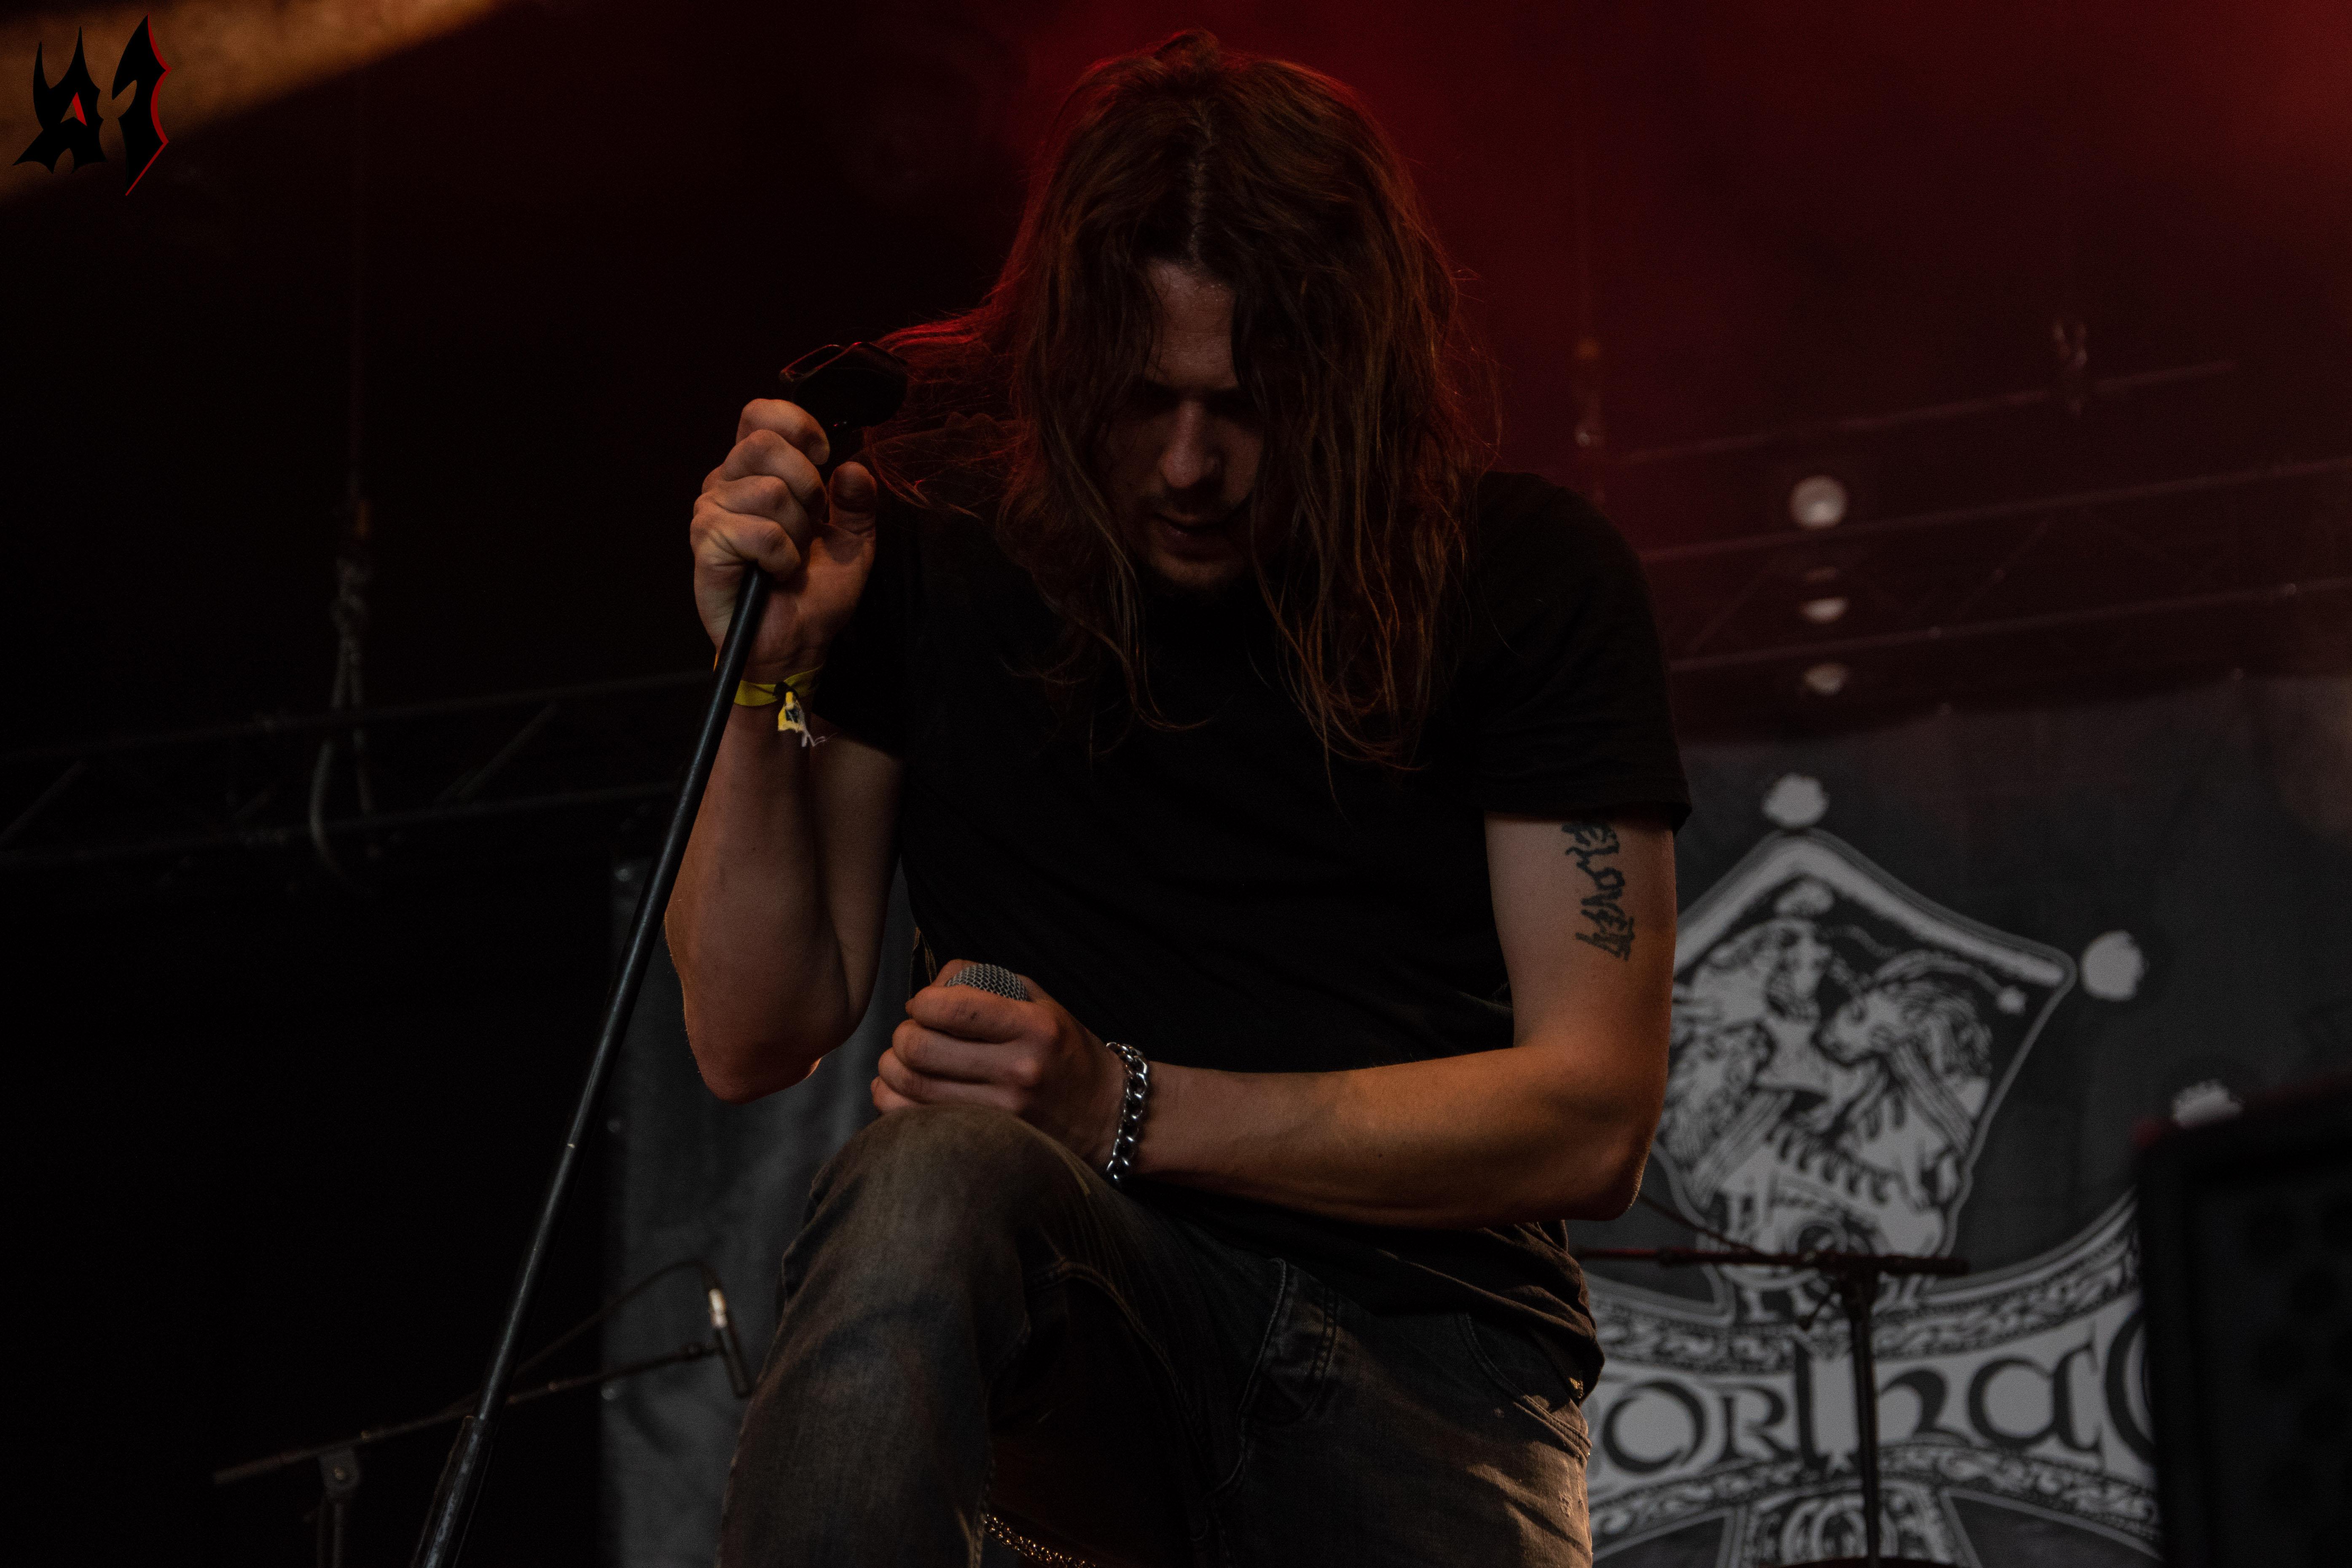 Hellfest - Aorlhac - 9